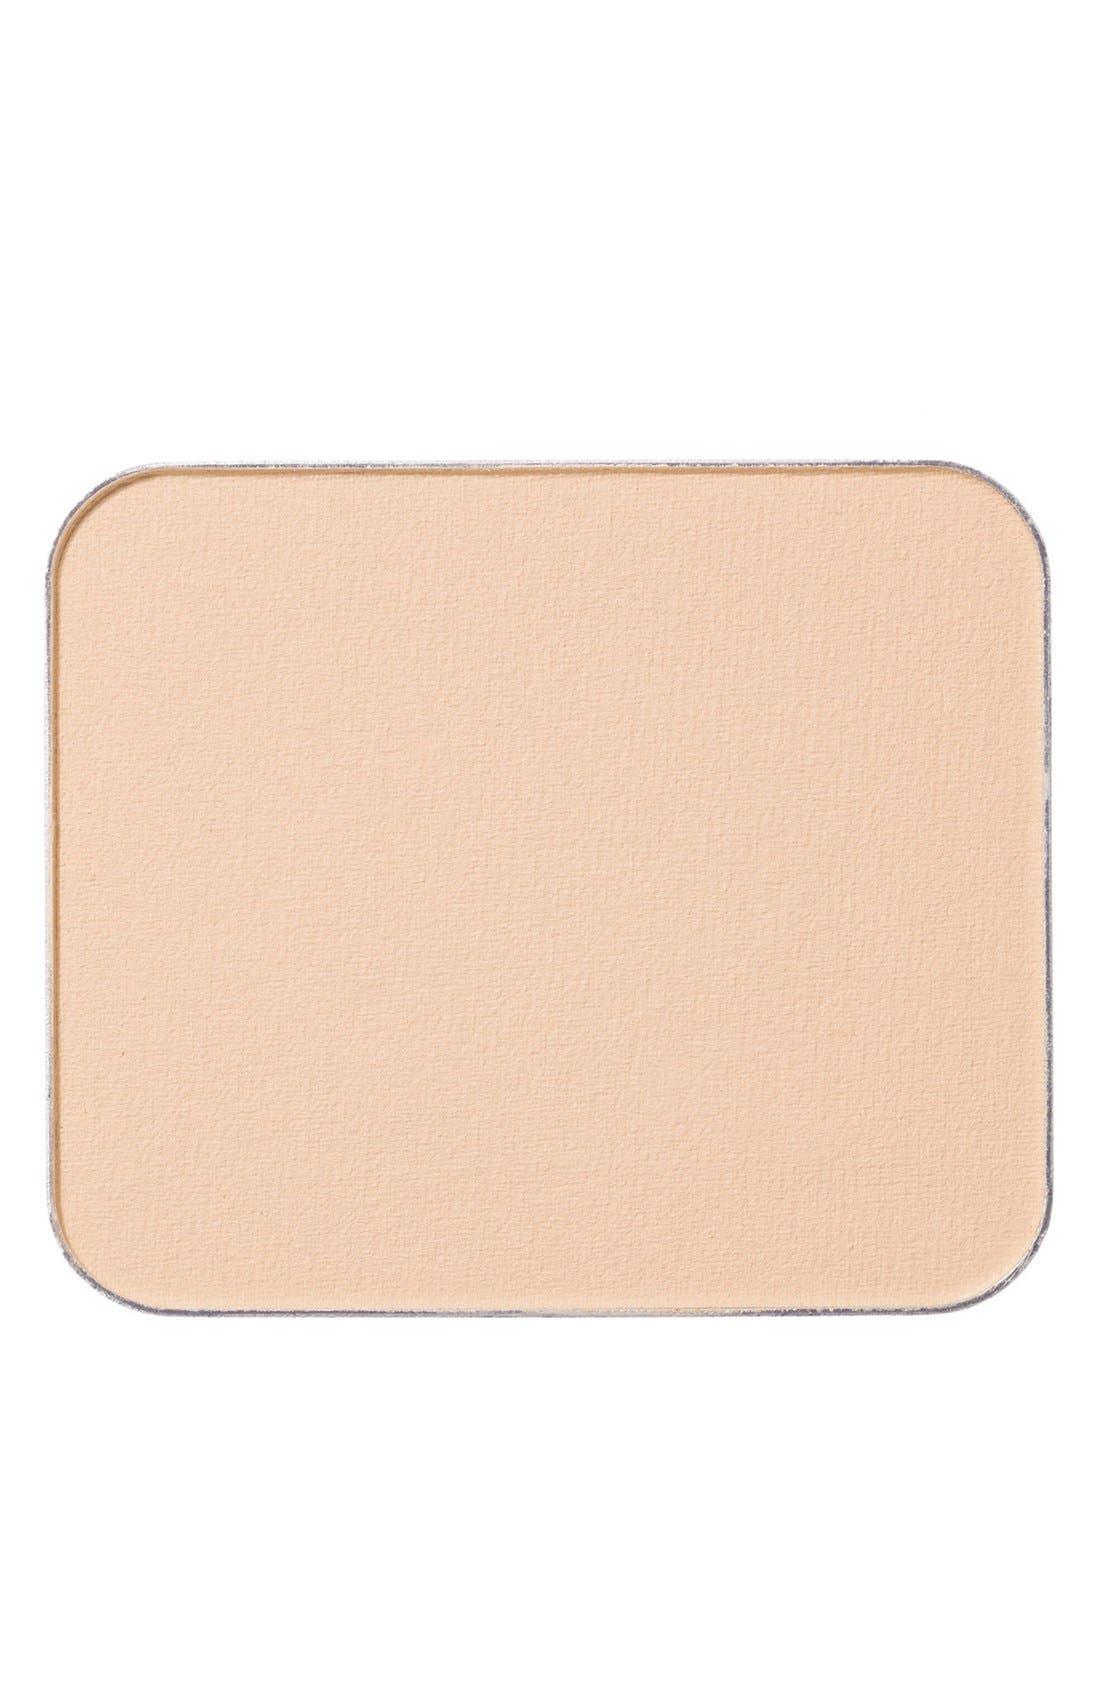 Maifanshi Silky Moisture Powder Compact Refill,                         Main,                         color, 012